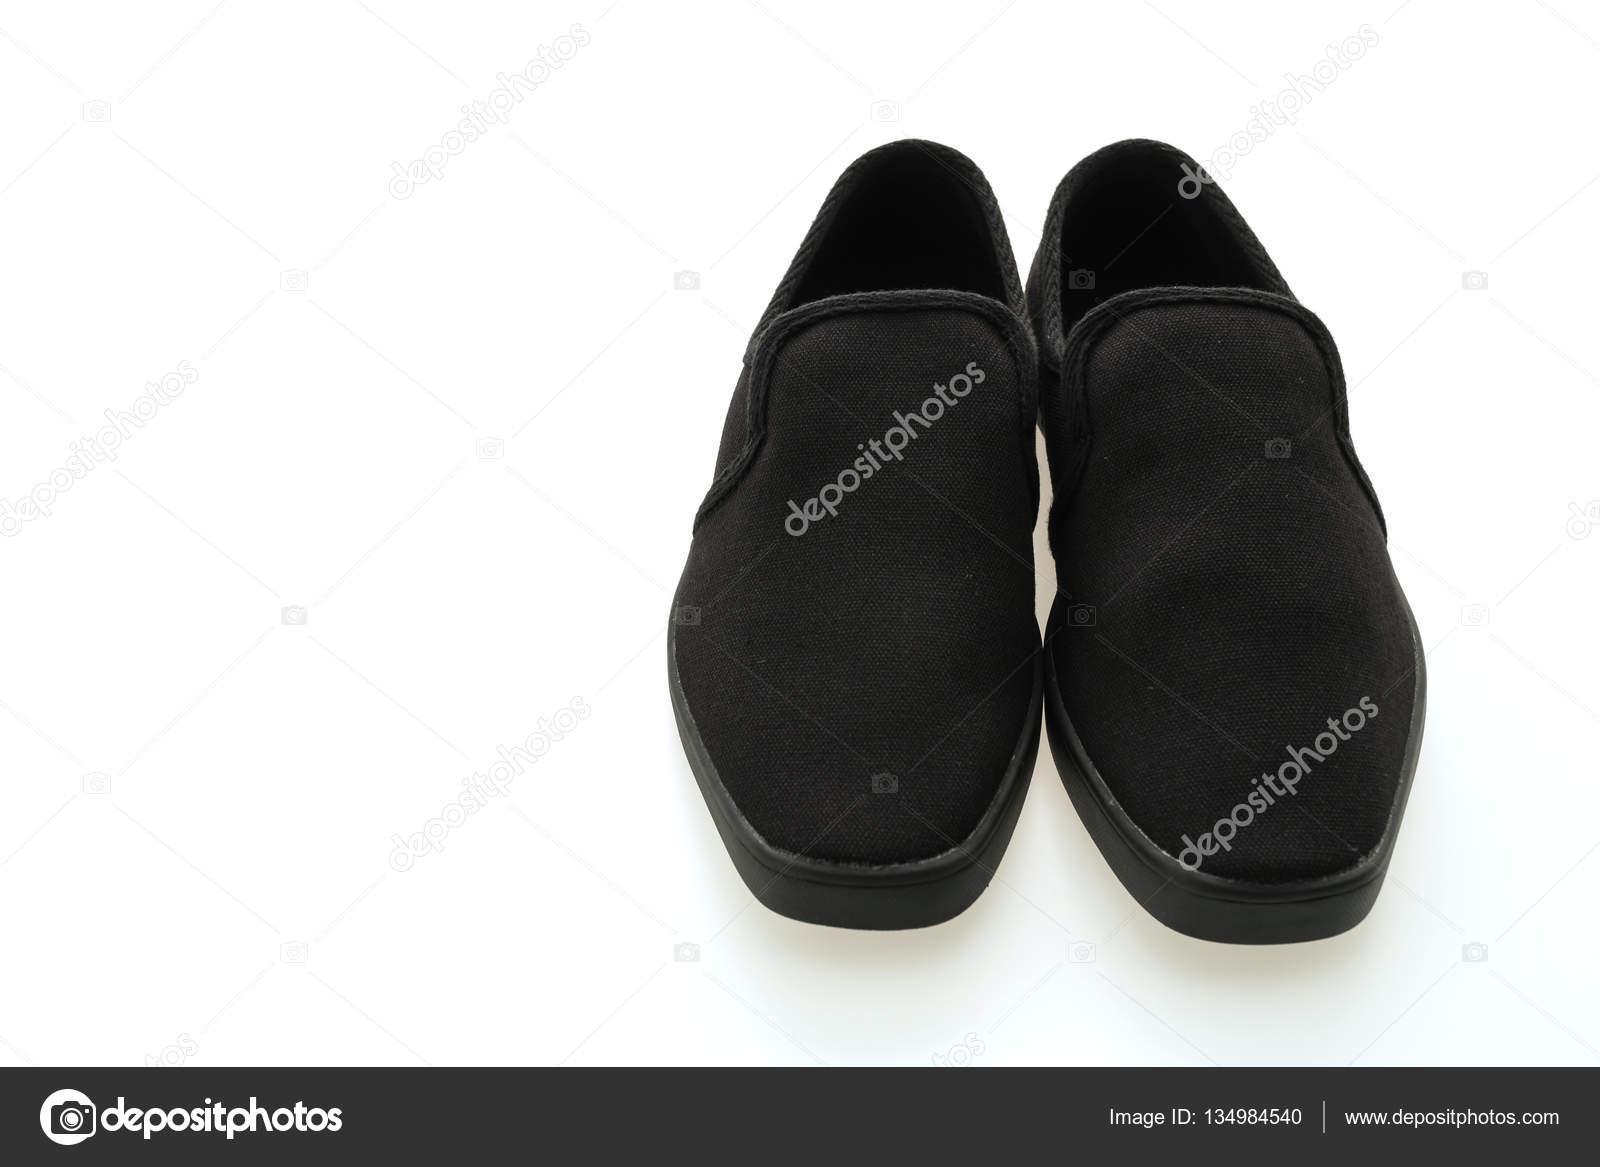 a820cf904b4 Μόδα παπούτσια και αθλητικά — Φωτογραφία Αρχείου © mrsiraphol #134984540